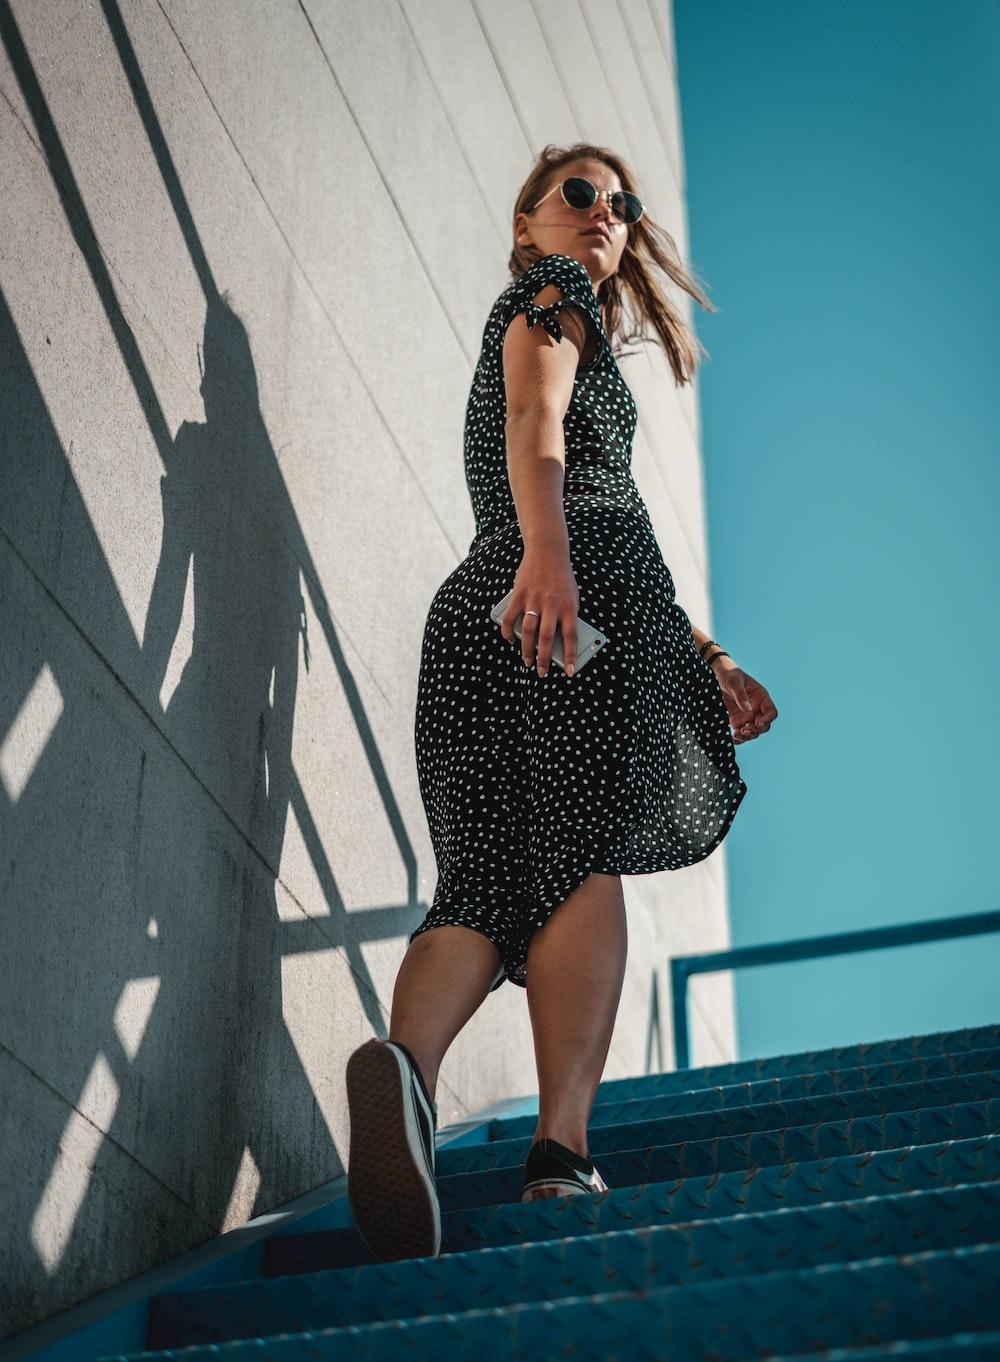 woman holding smartphone wearing black dress